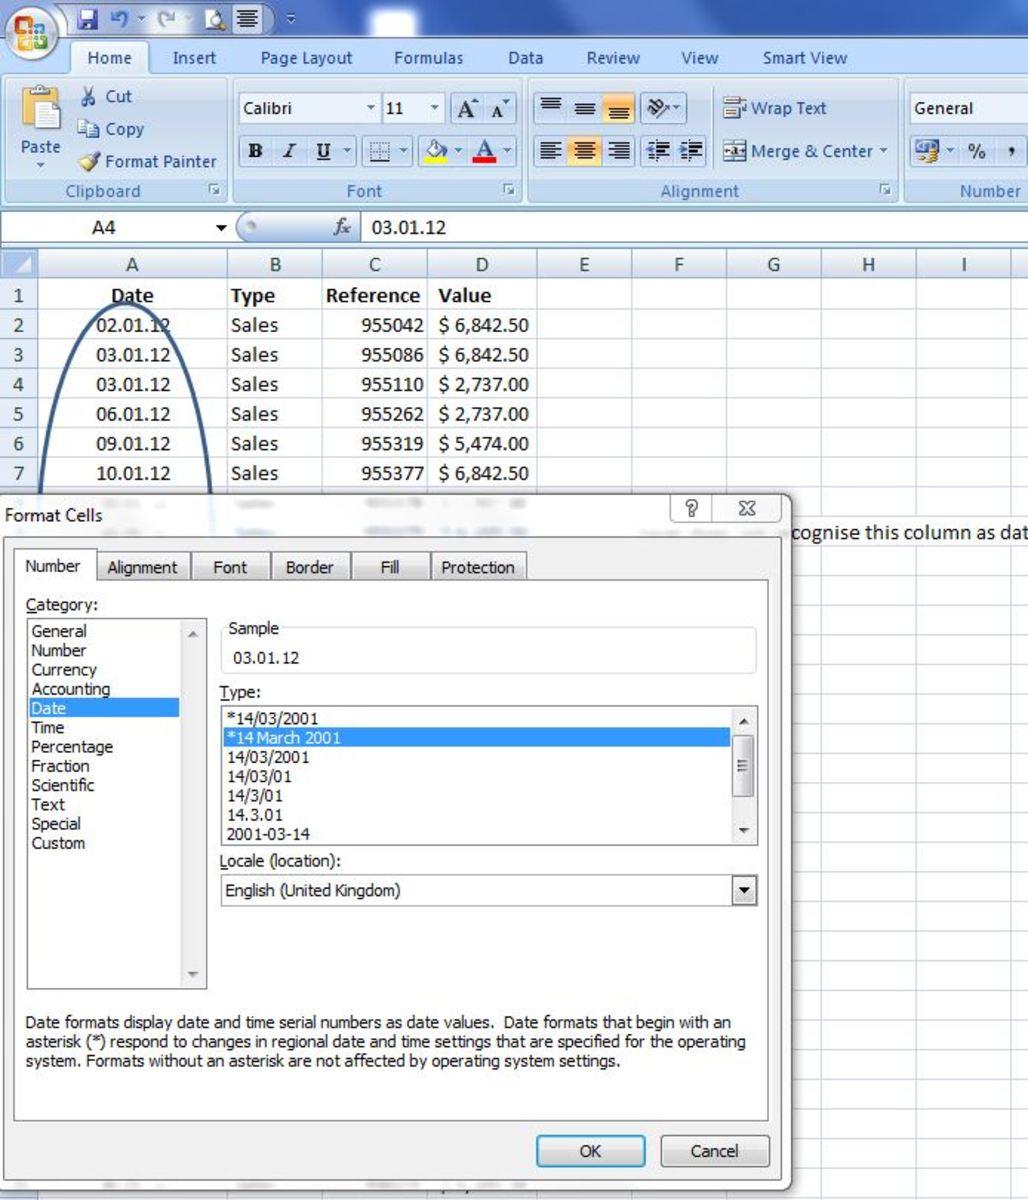 excel-problems-fix-date-formats